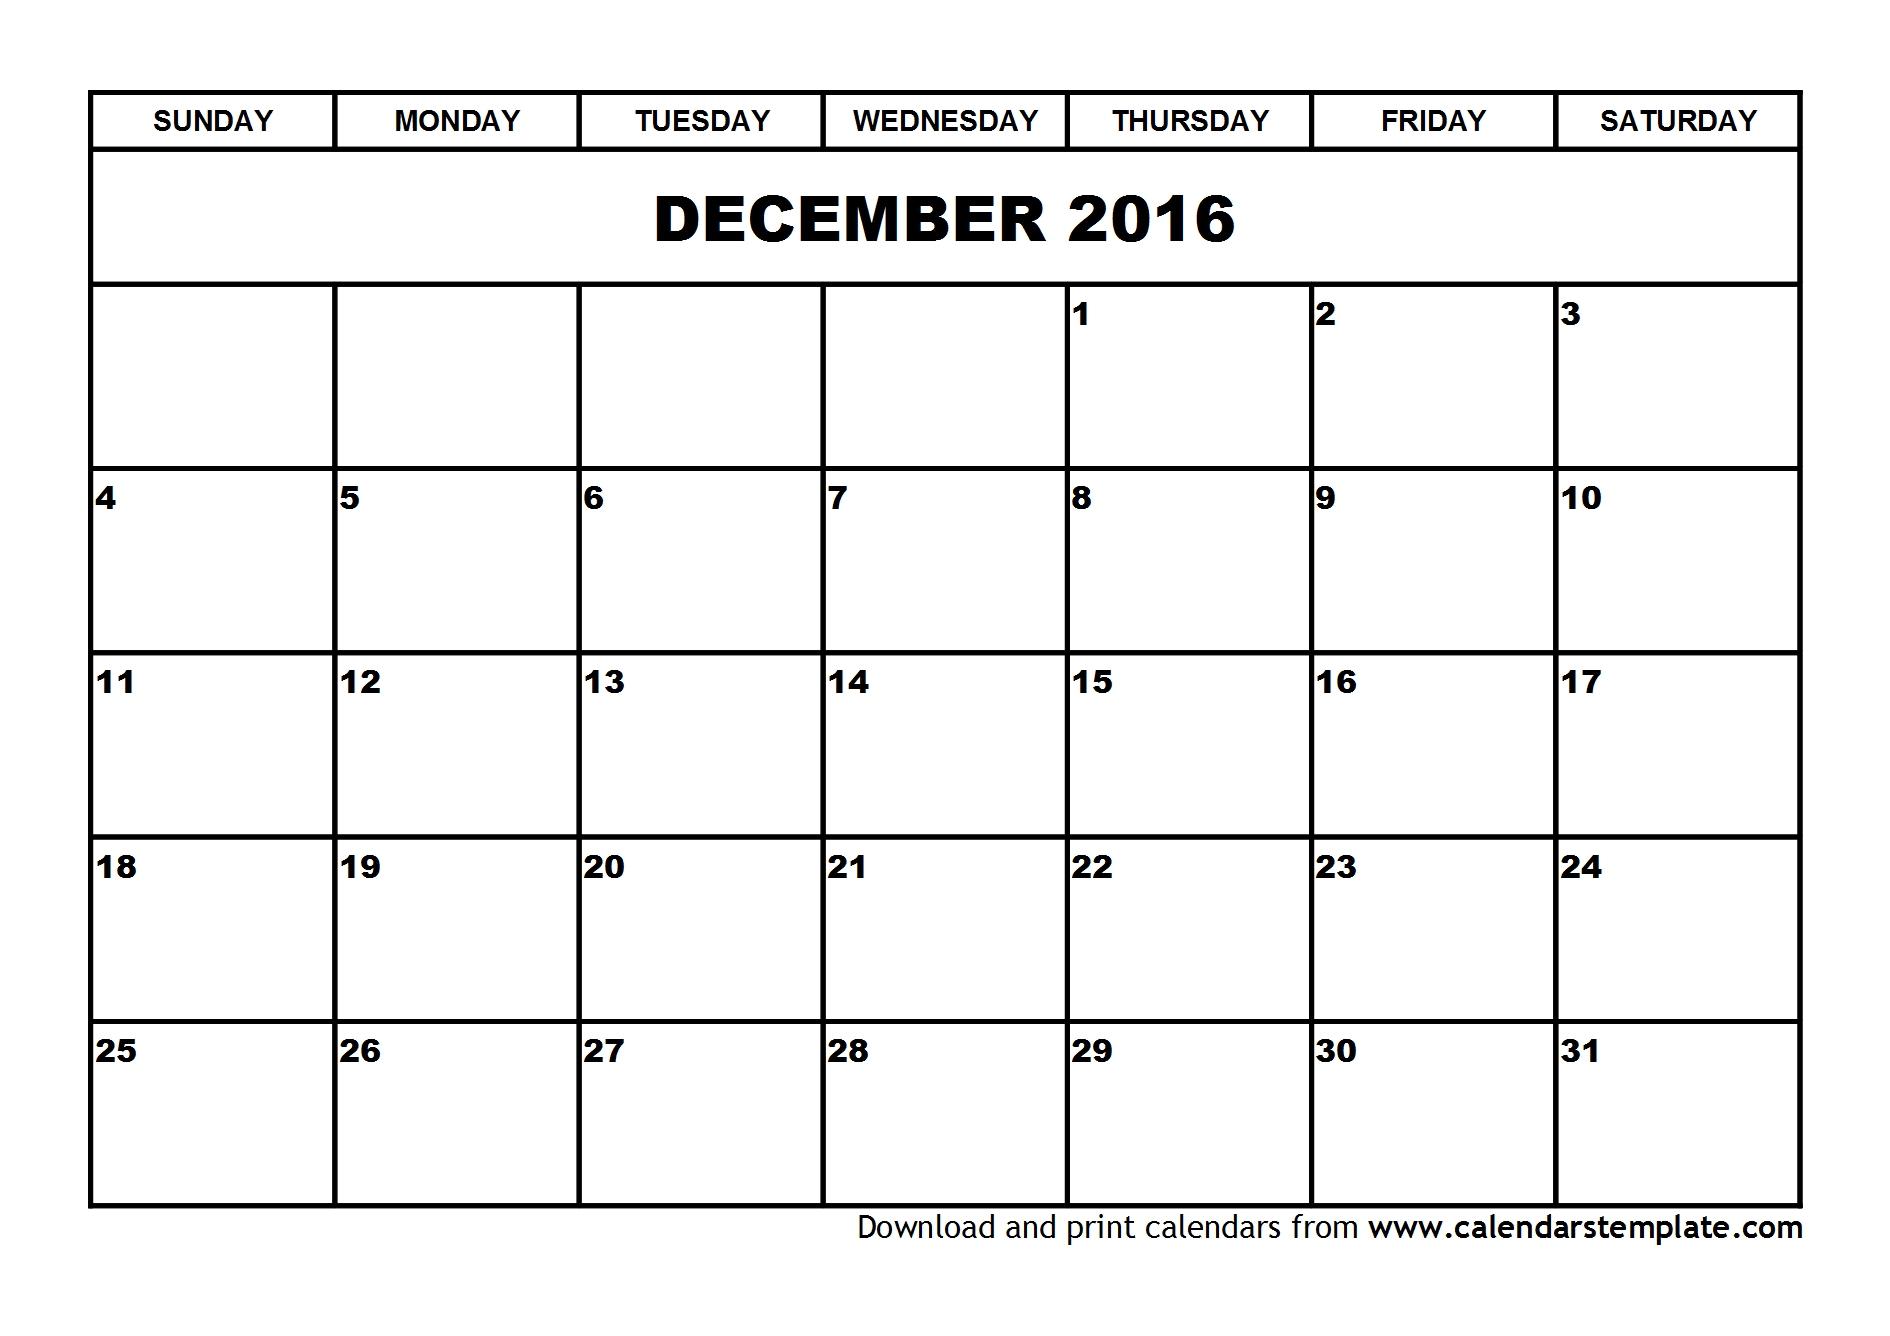 009 Blank Calendar Template Ideas November Printable December Pdf within December Blank Calendar Printable